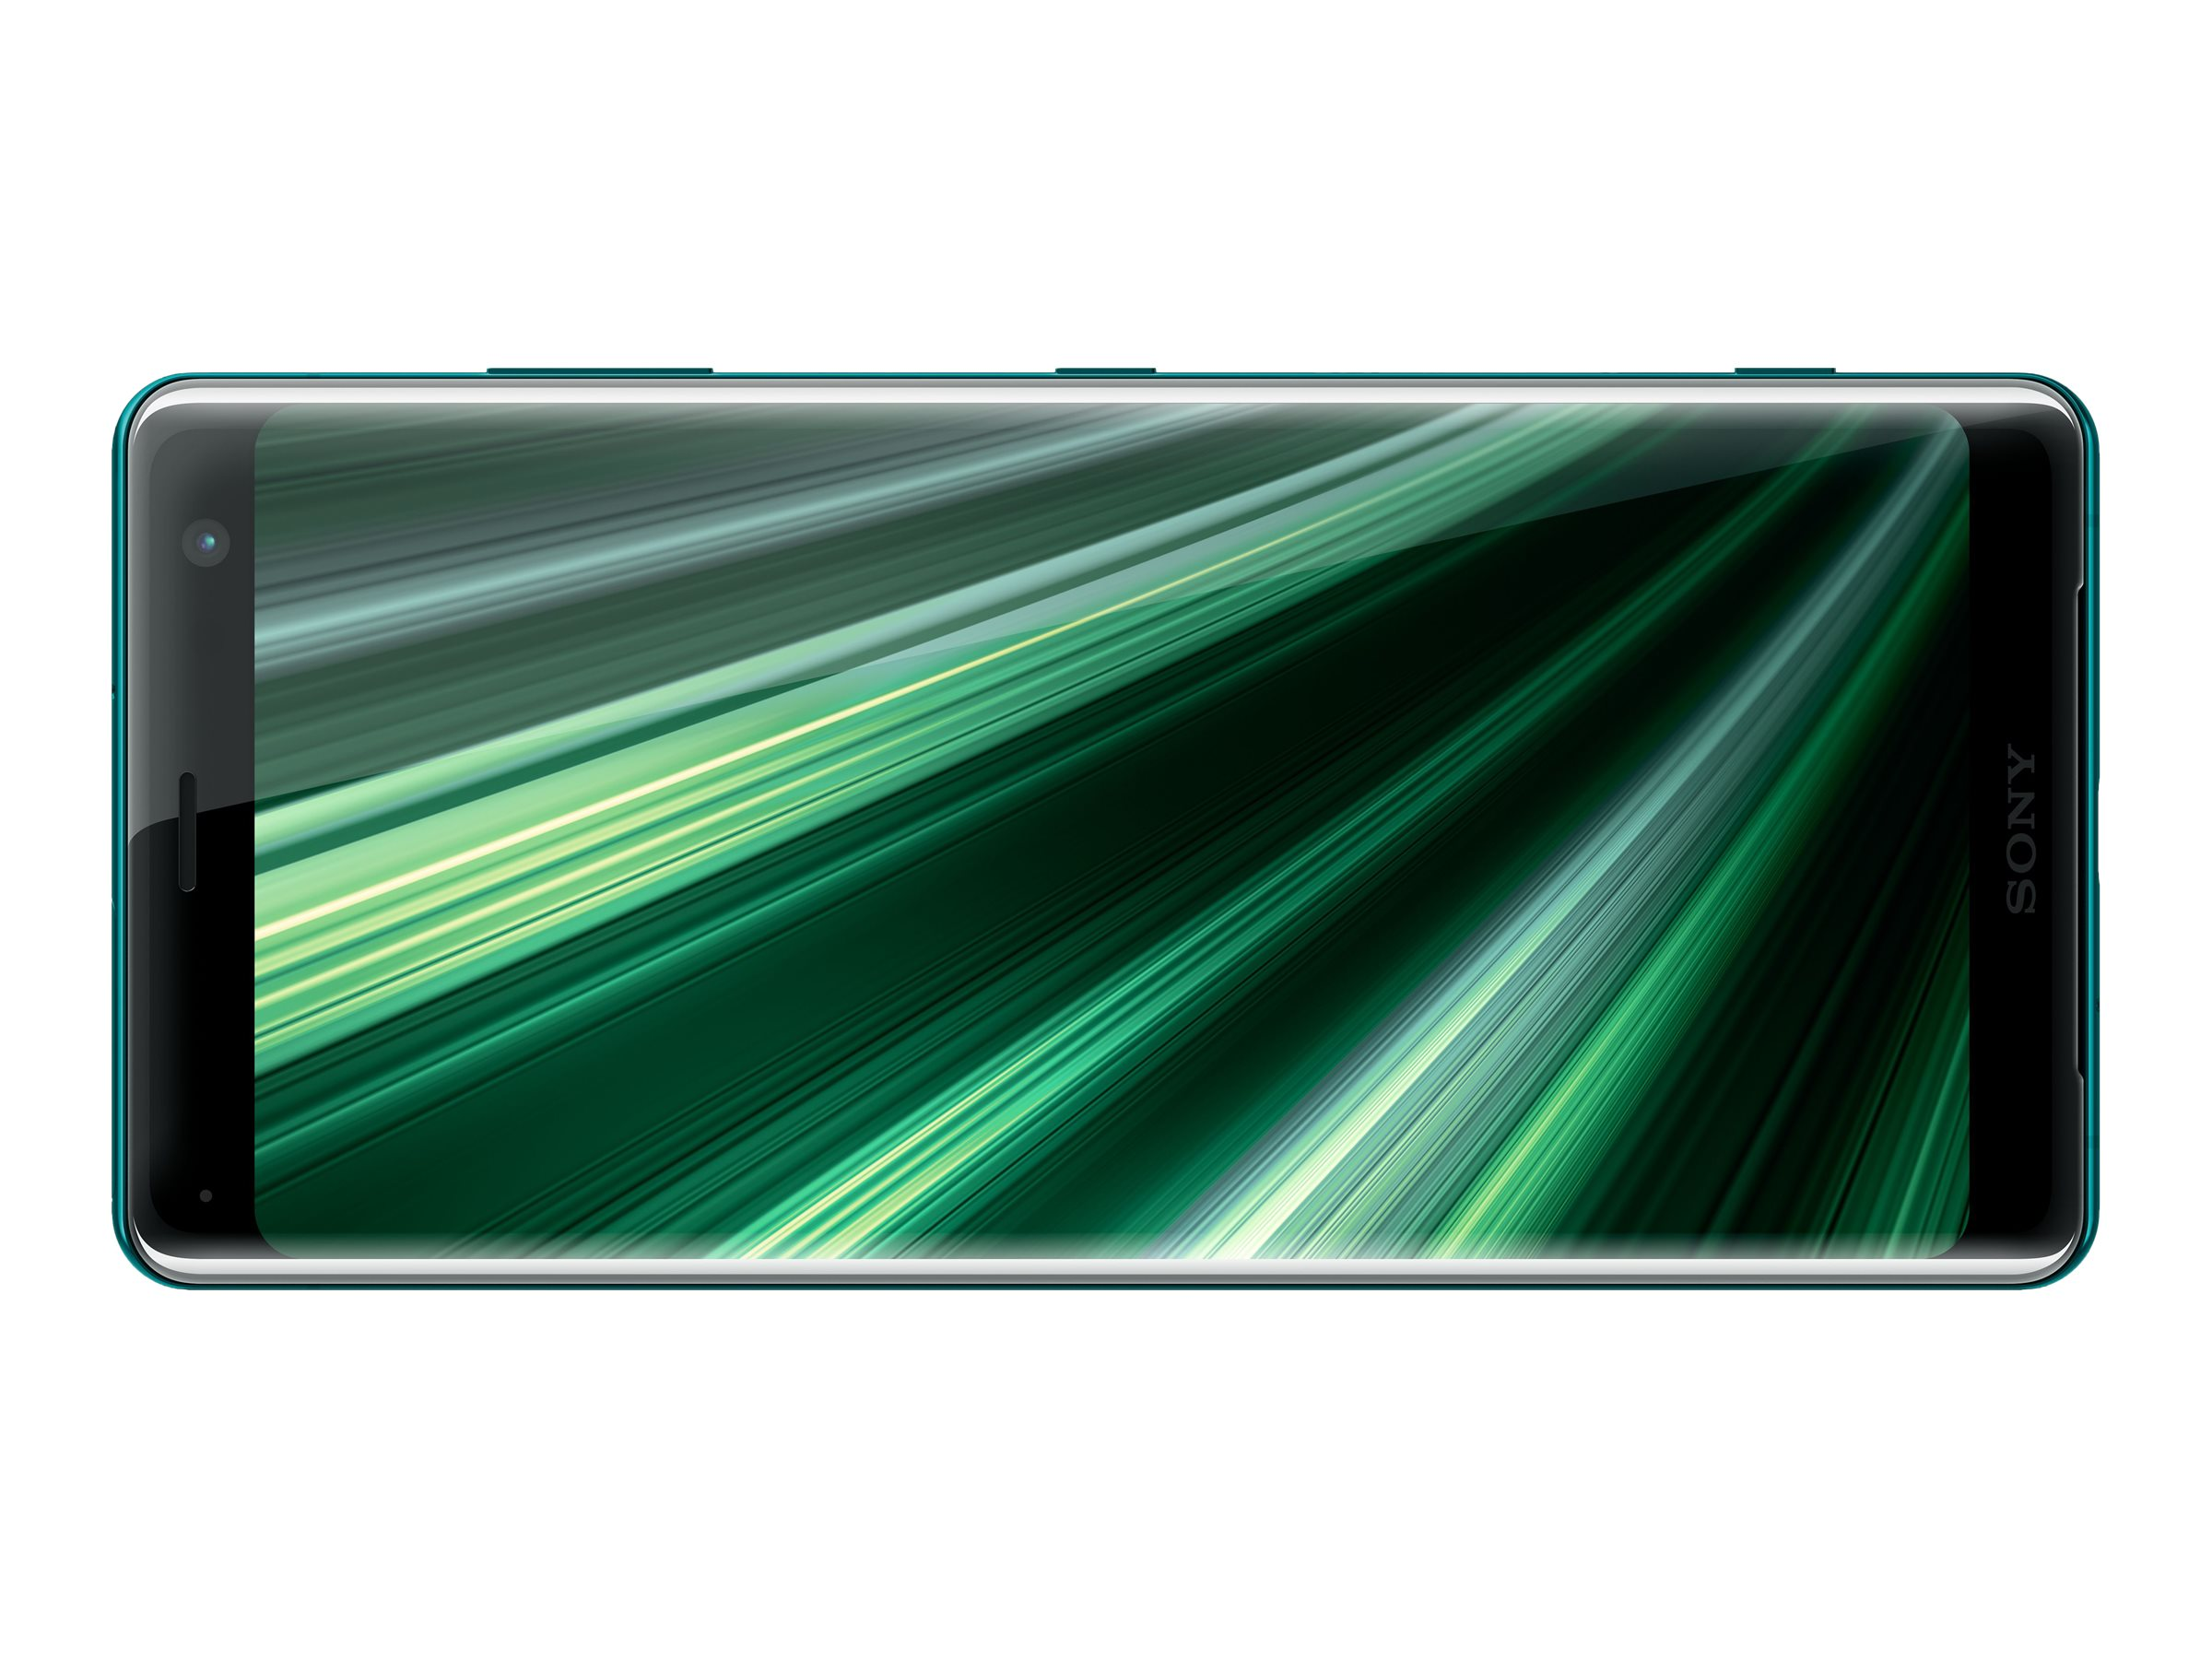 Sony XPERIA XZ3 - H9493 - Smartphone - Dual-SIM - 4G LTE - 64 GB